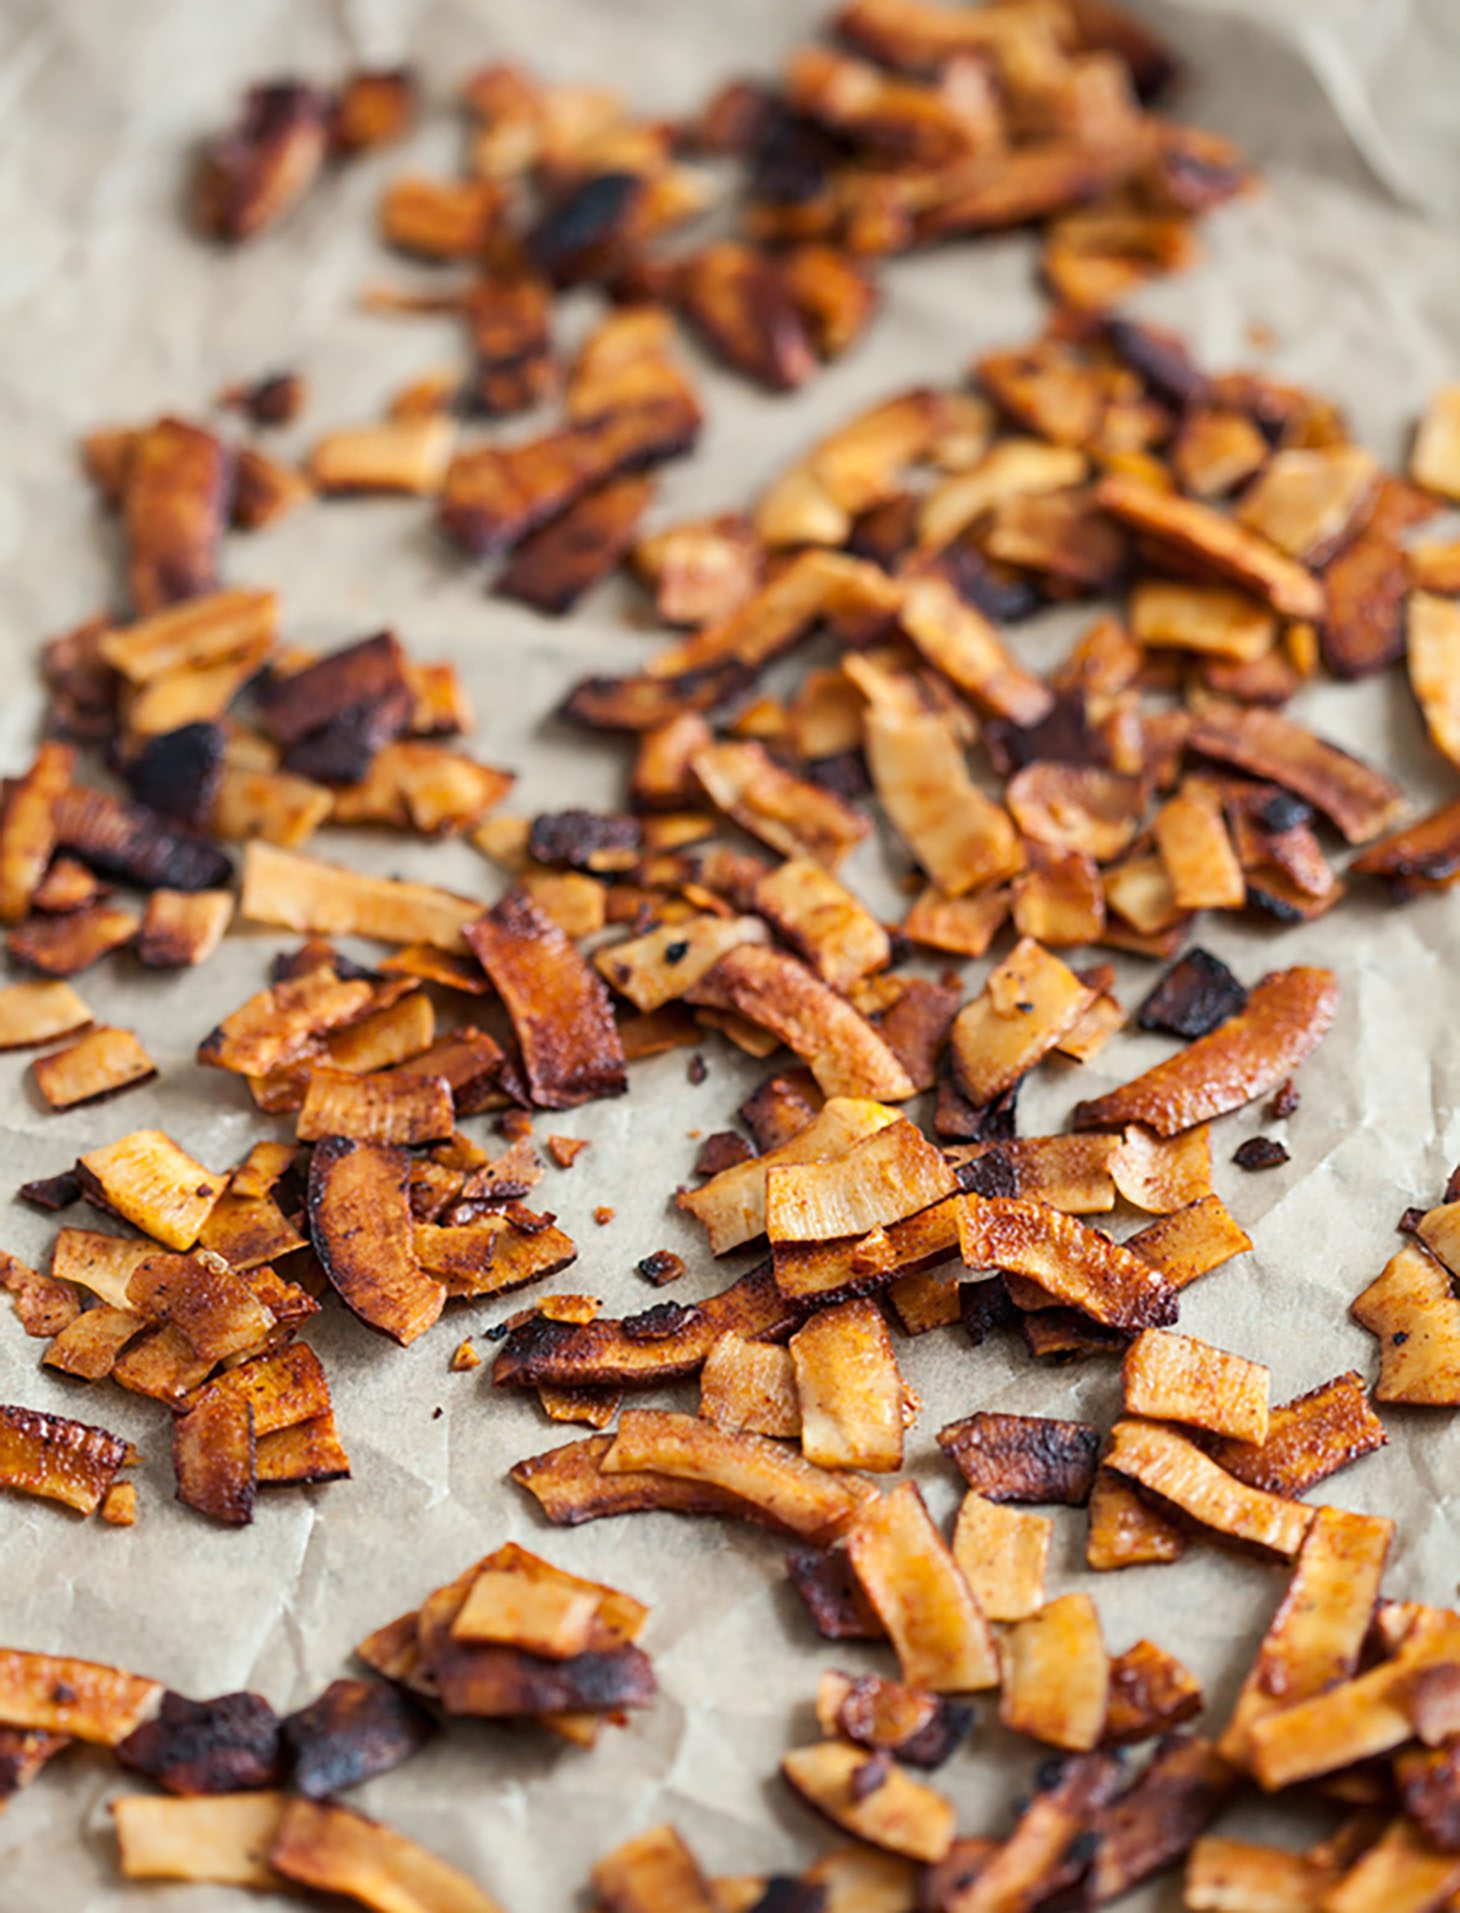 Jillian Harris Guide to Bacon Alternatives